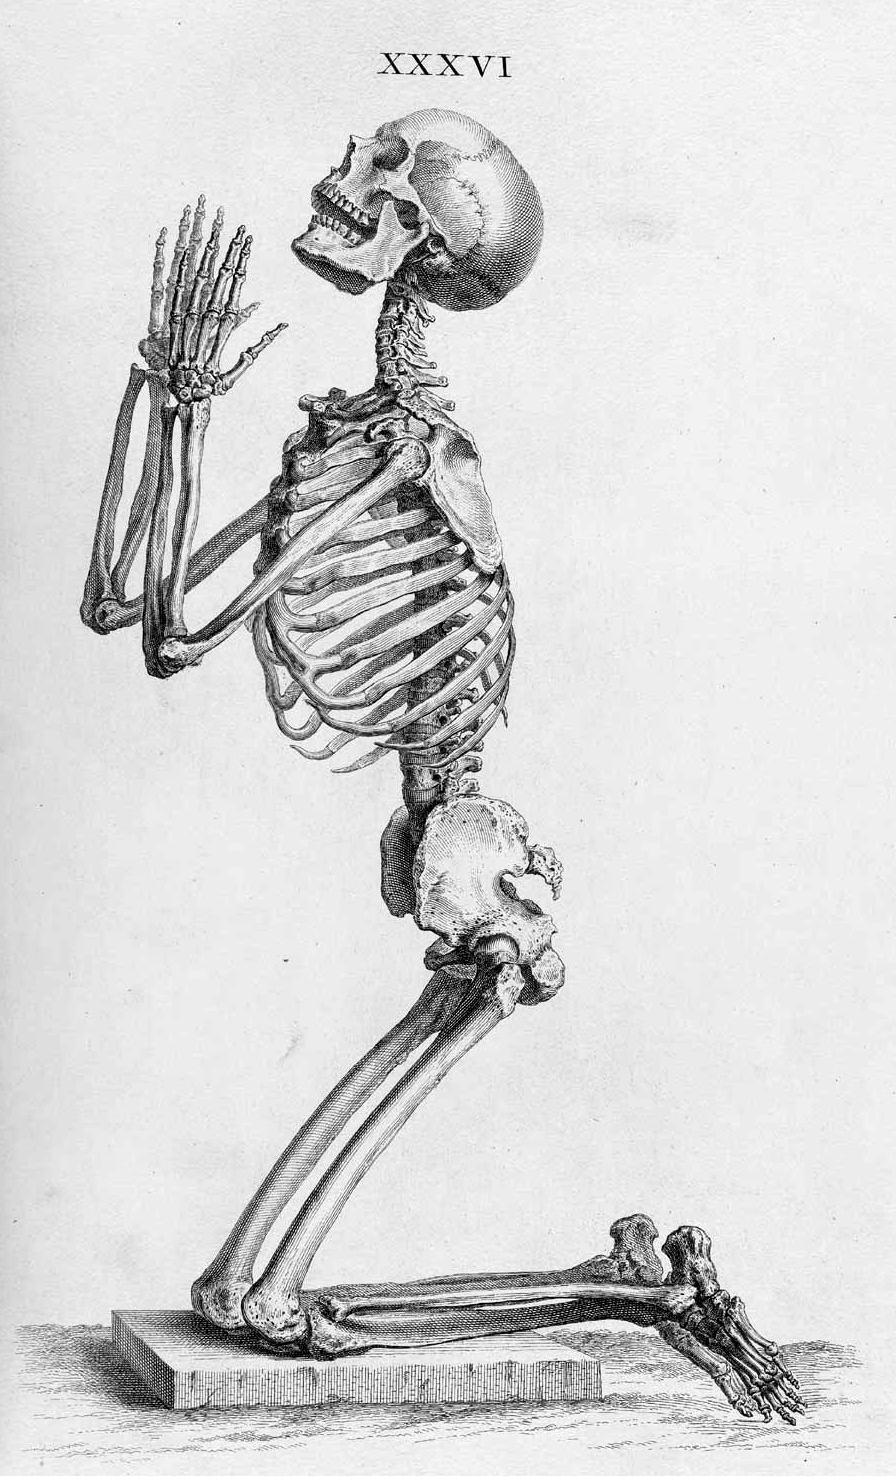 Bone types Top: Metacarpals (long bones) and